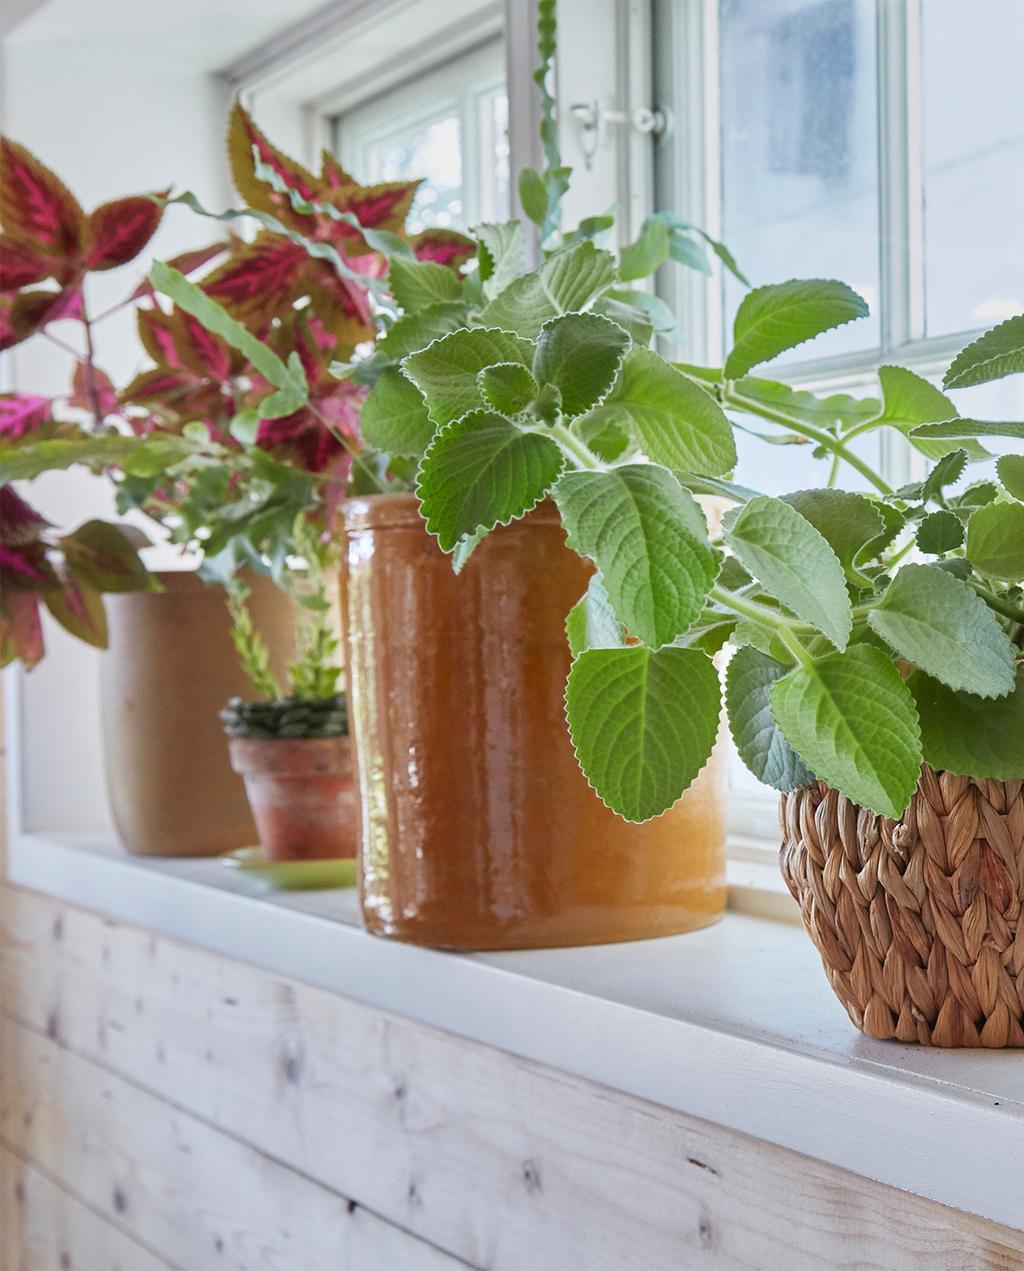 vtwonen special zomerhuizen 07-2021 | verschillende planten op de vensterbank